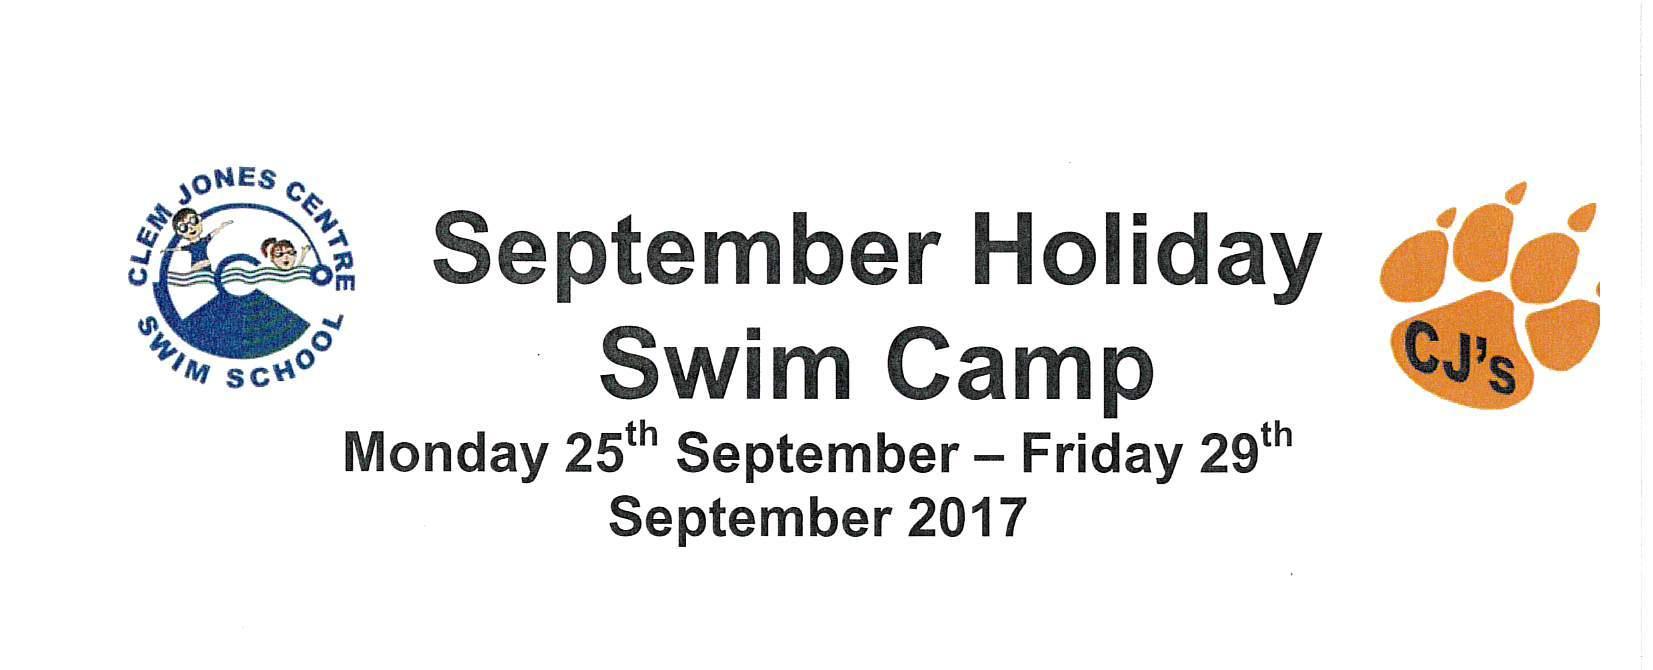 September Holiday Swim Camp 2017